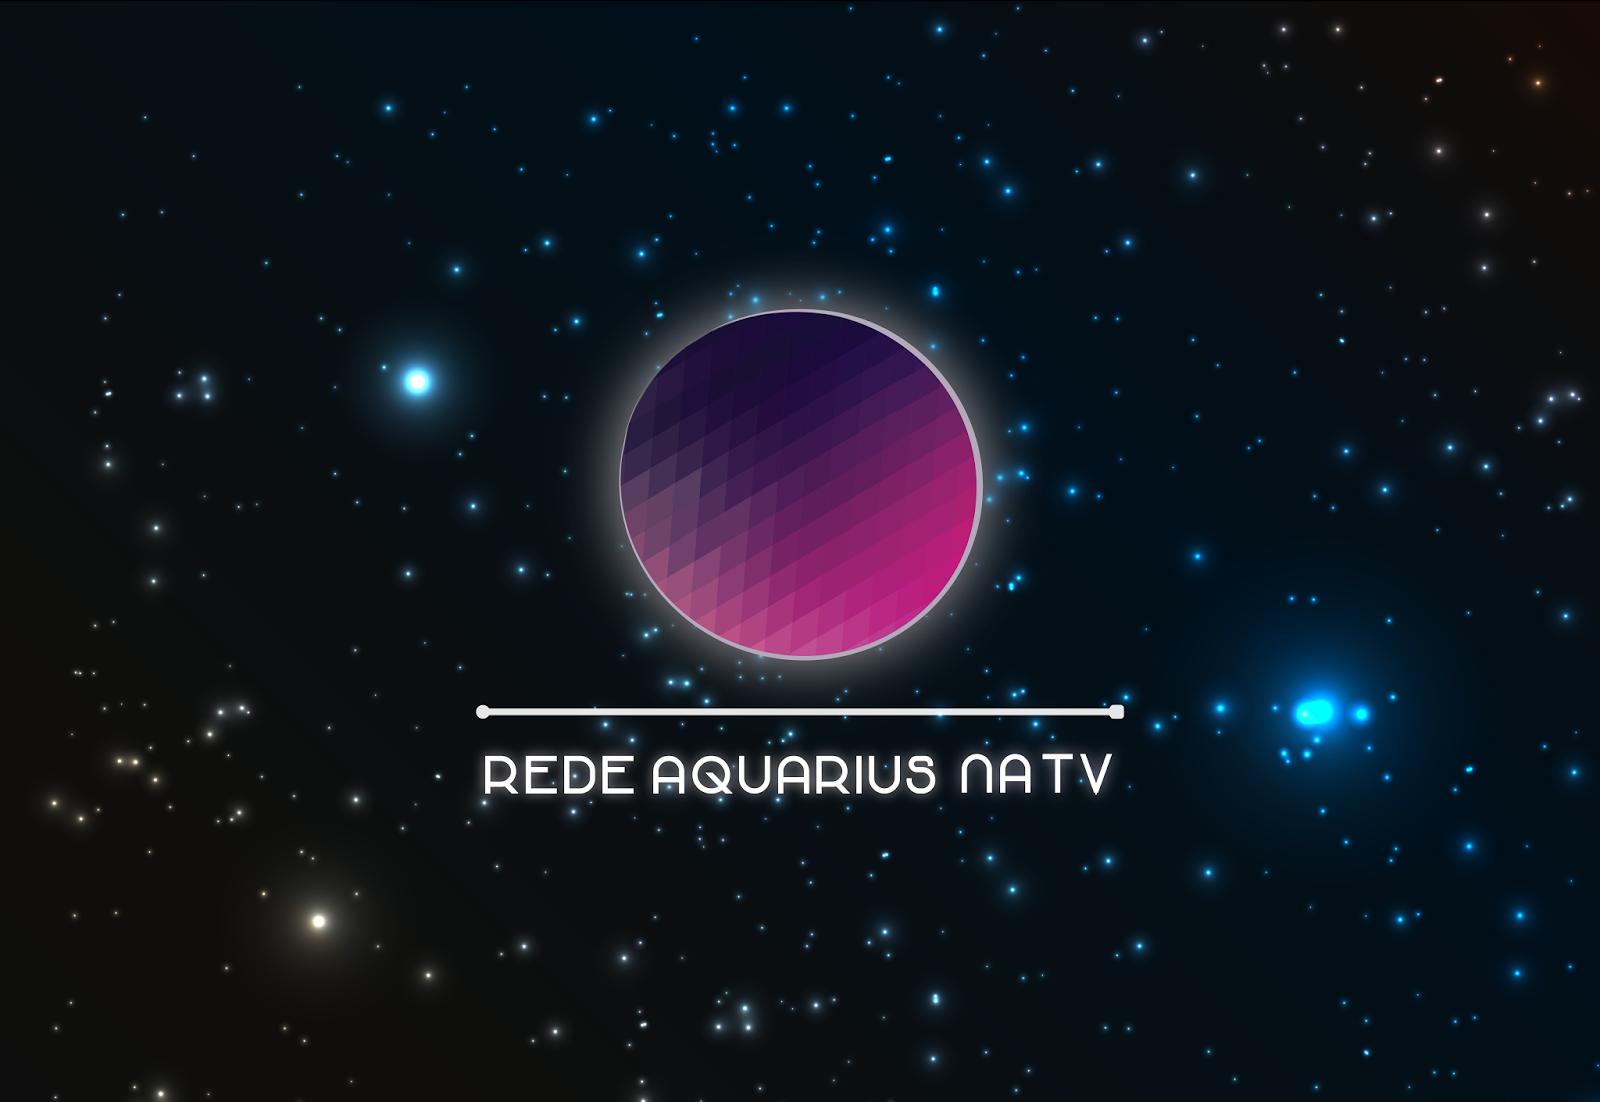 Rede Aquarius na TV